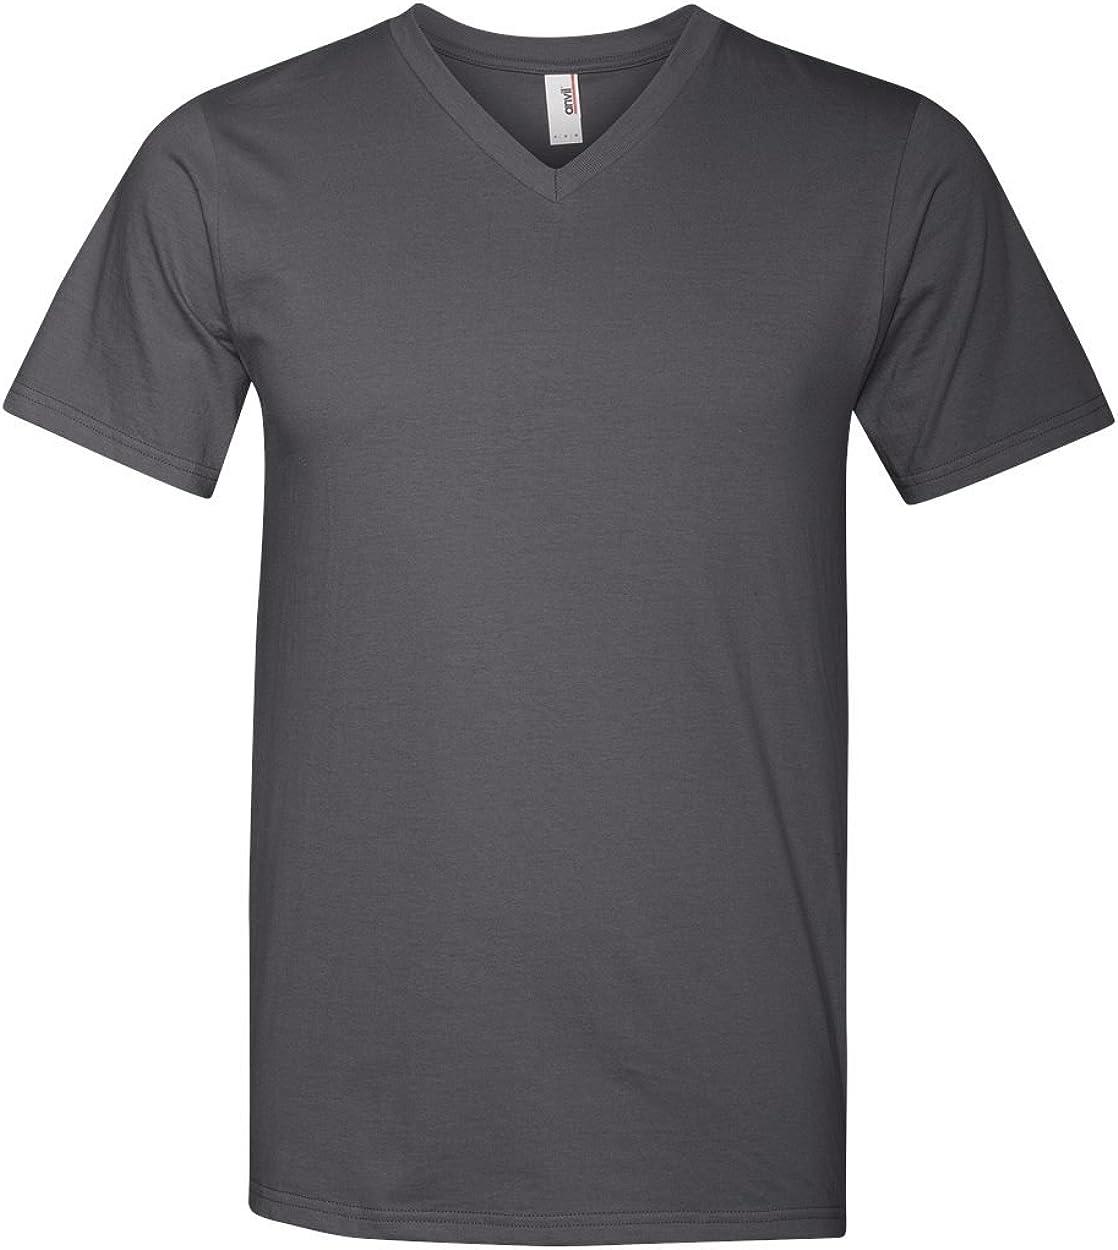 Anvil Adult Fashion Preshrunk Shoulder Taping T-Shirt